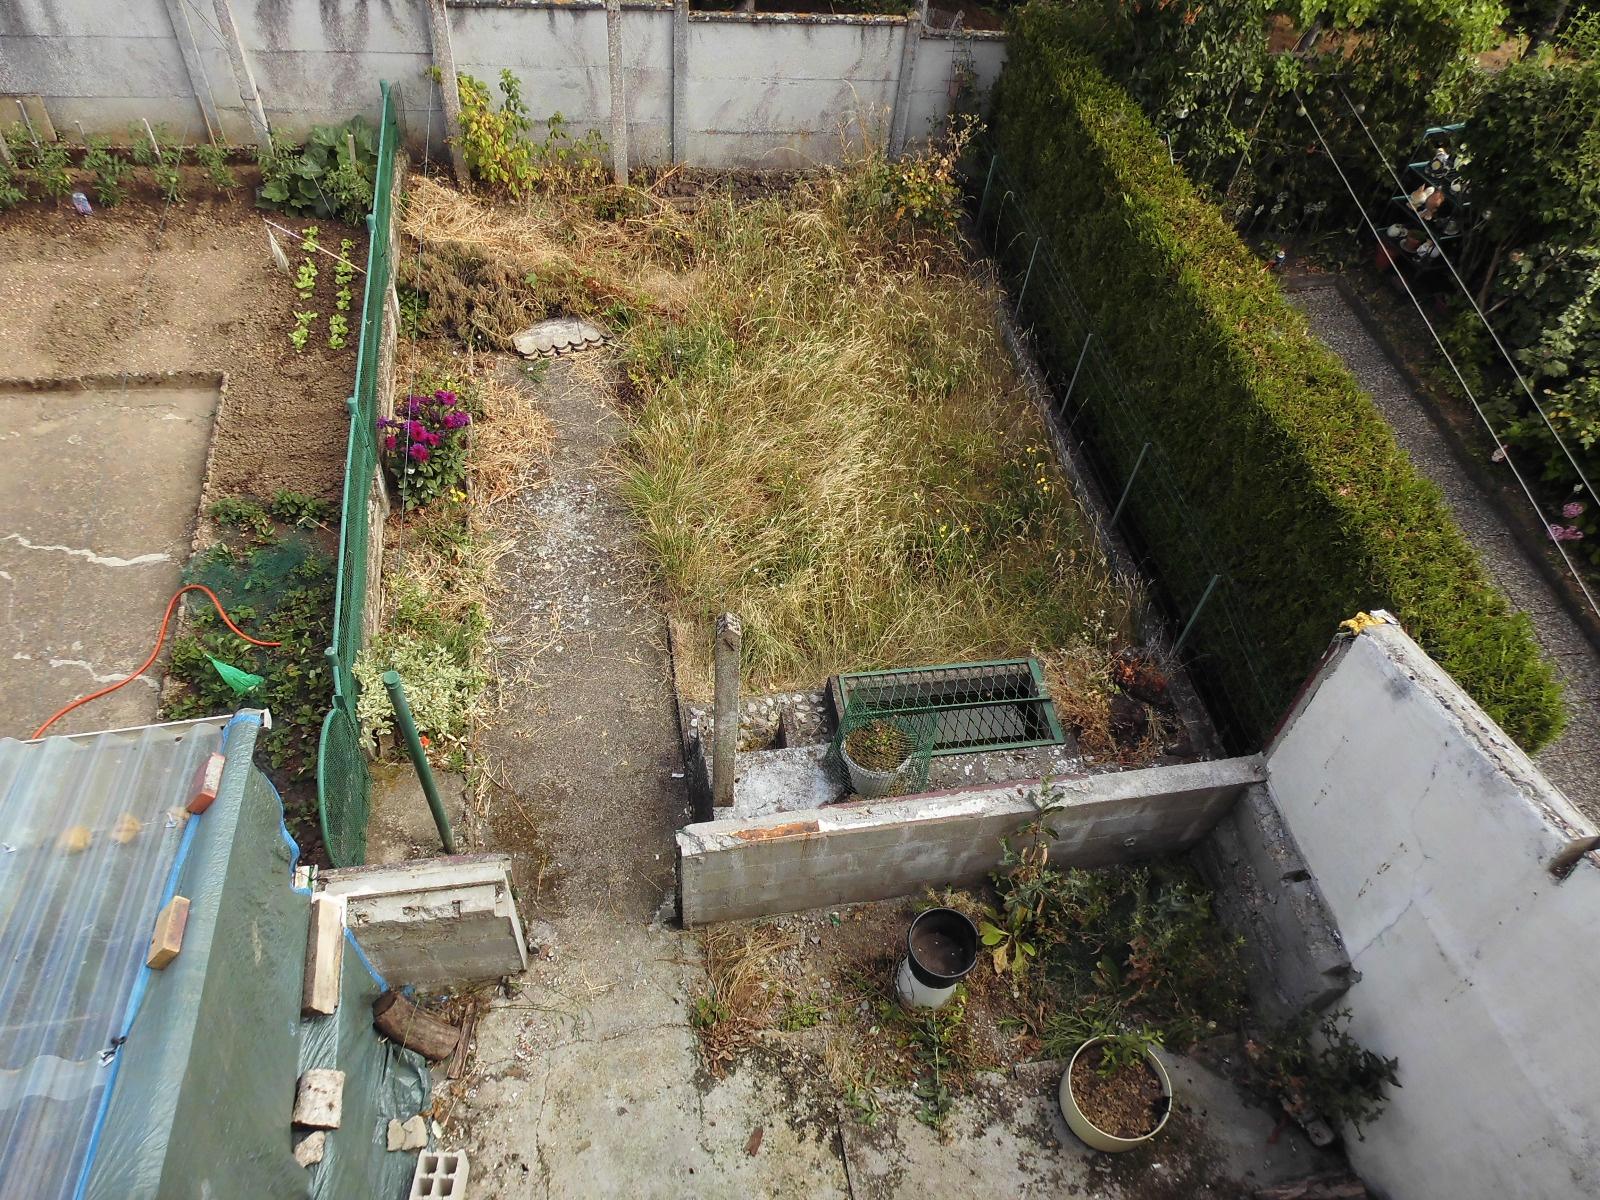 Vente chateaudun maison 4 pieces for Garage ad chateaudun